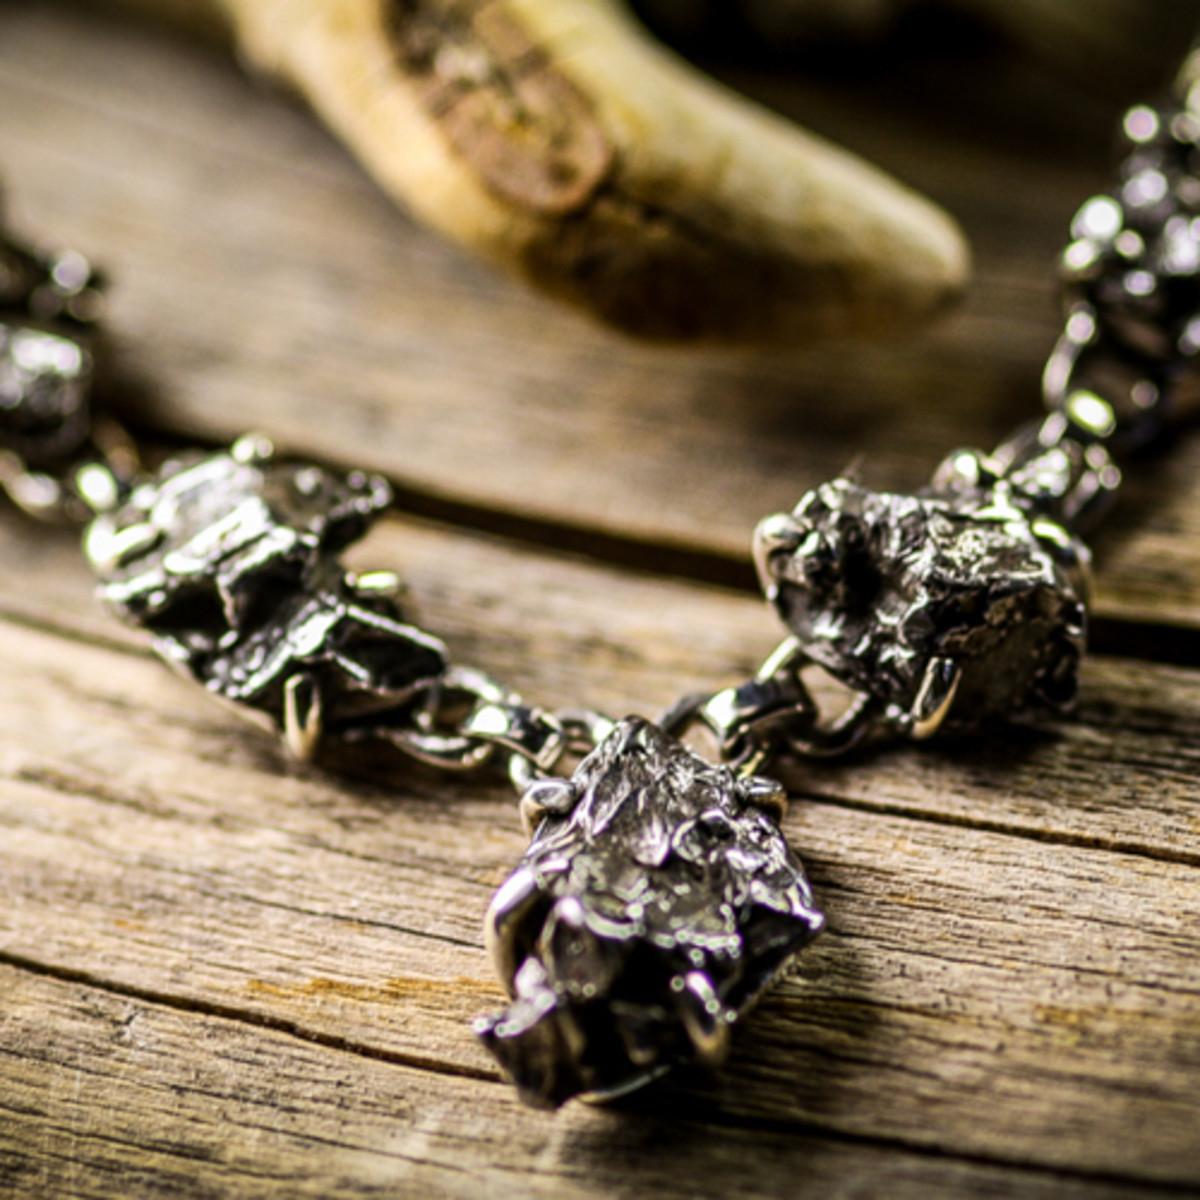 A meteor chain